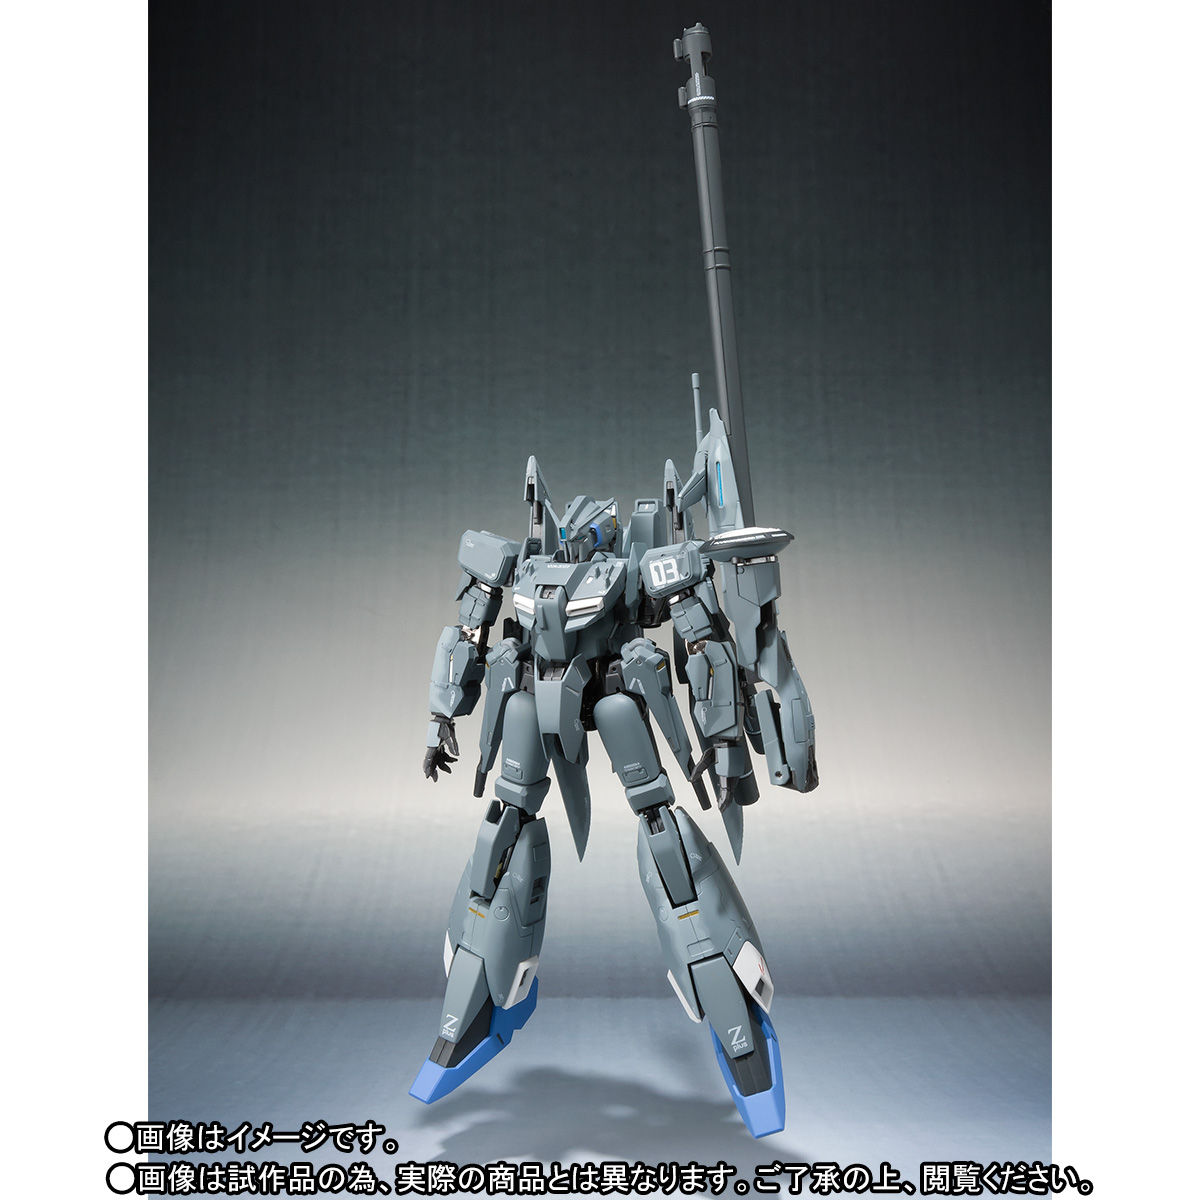 METAL ROBOT魂(Ka signature)<SIDE MS>『ゼータプラス C1(03 シグマン機)』可動フィギュア-004